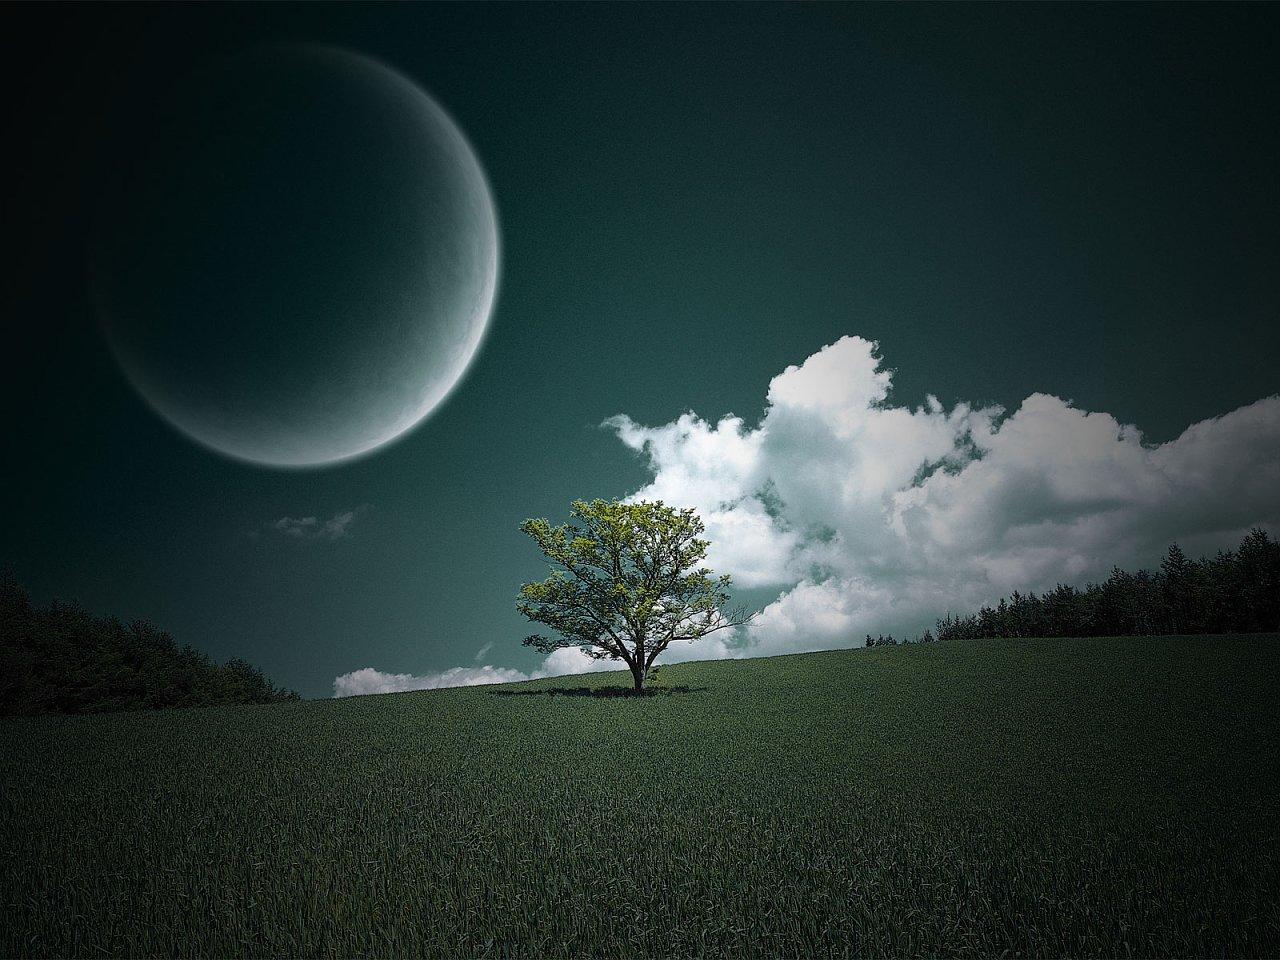 http://2.bp.blogspot.com/_lTuLGFn_qac/TEXRt3tDzlI/AAAAAAAAAMA/JK3favAsjpA/s1600/13Daylight_Planet_Wallpaper_by_JaneDoe873.jpg